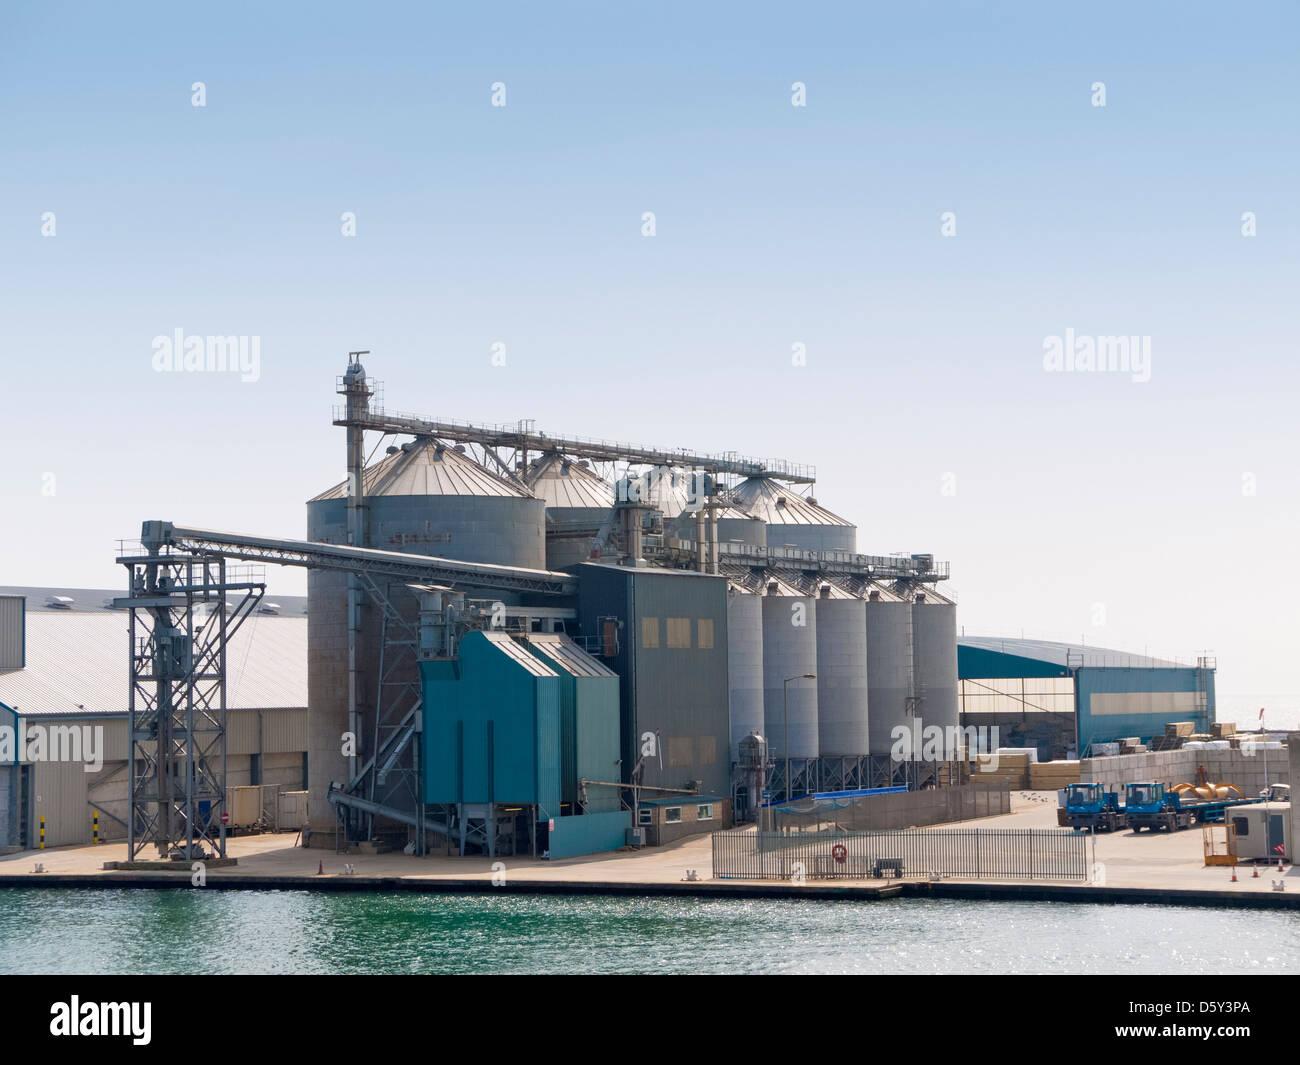 Storage silos for grain at Shoreham Port, East Sussex, UK - Stock Image